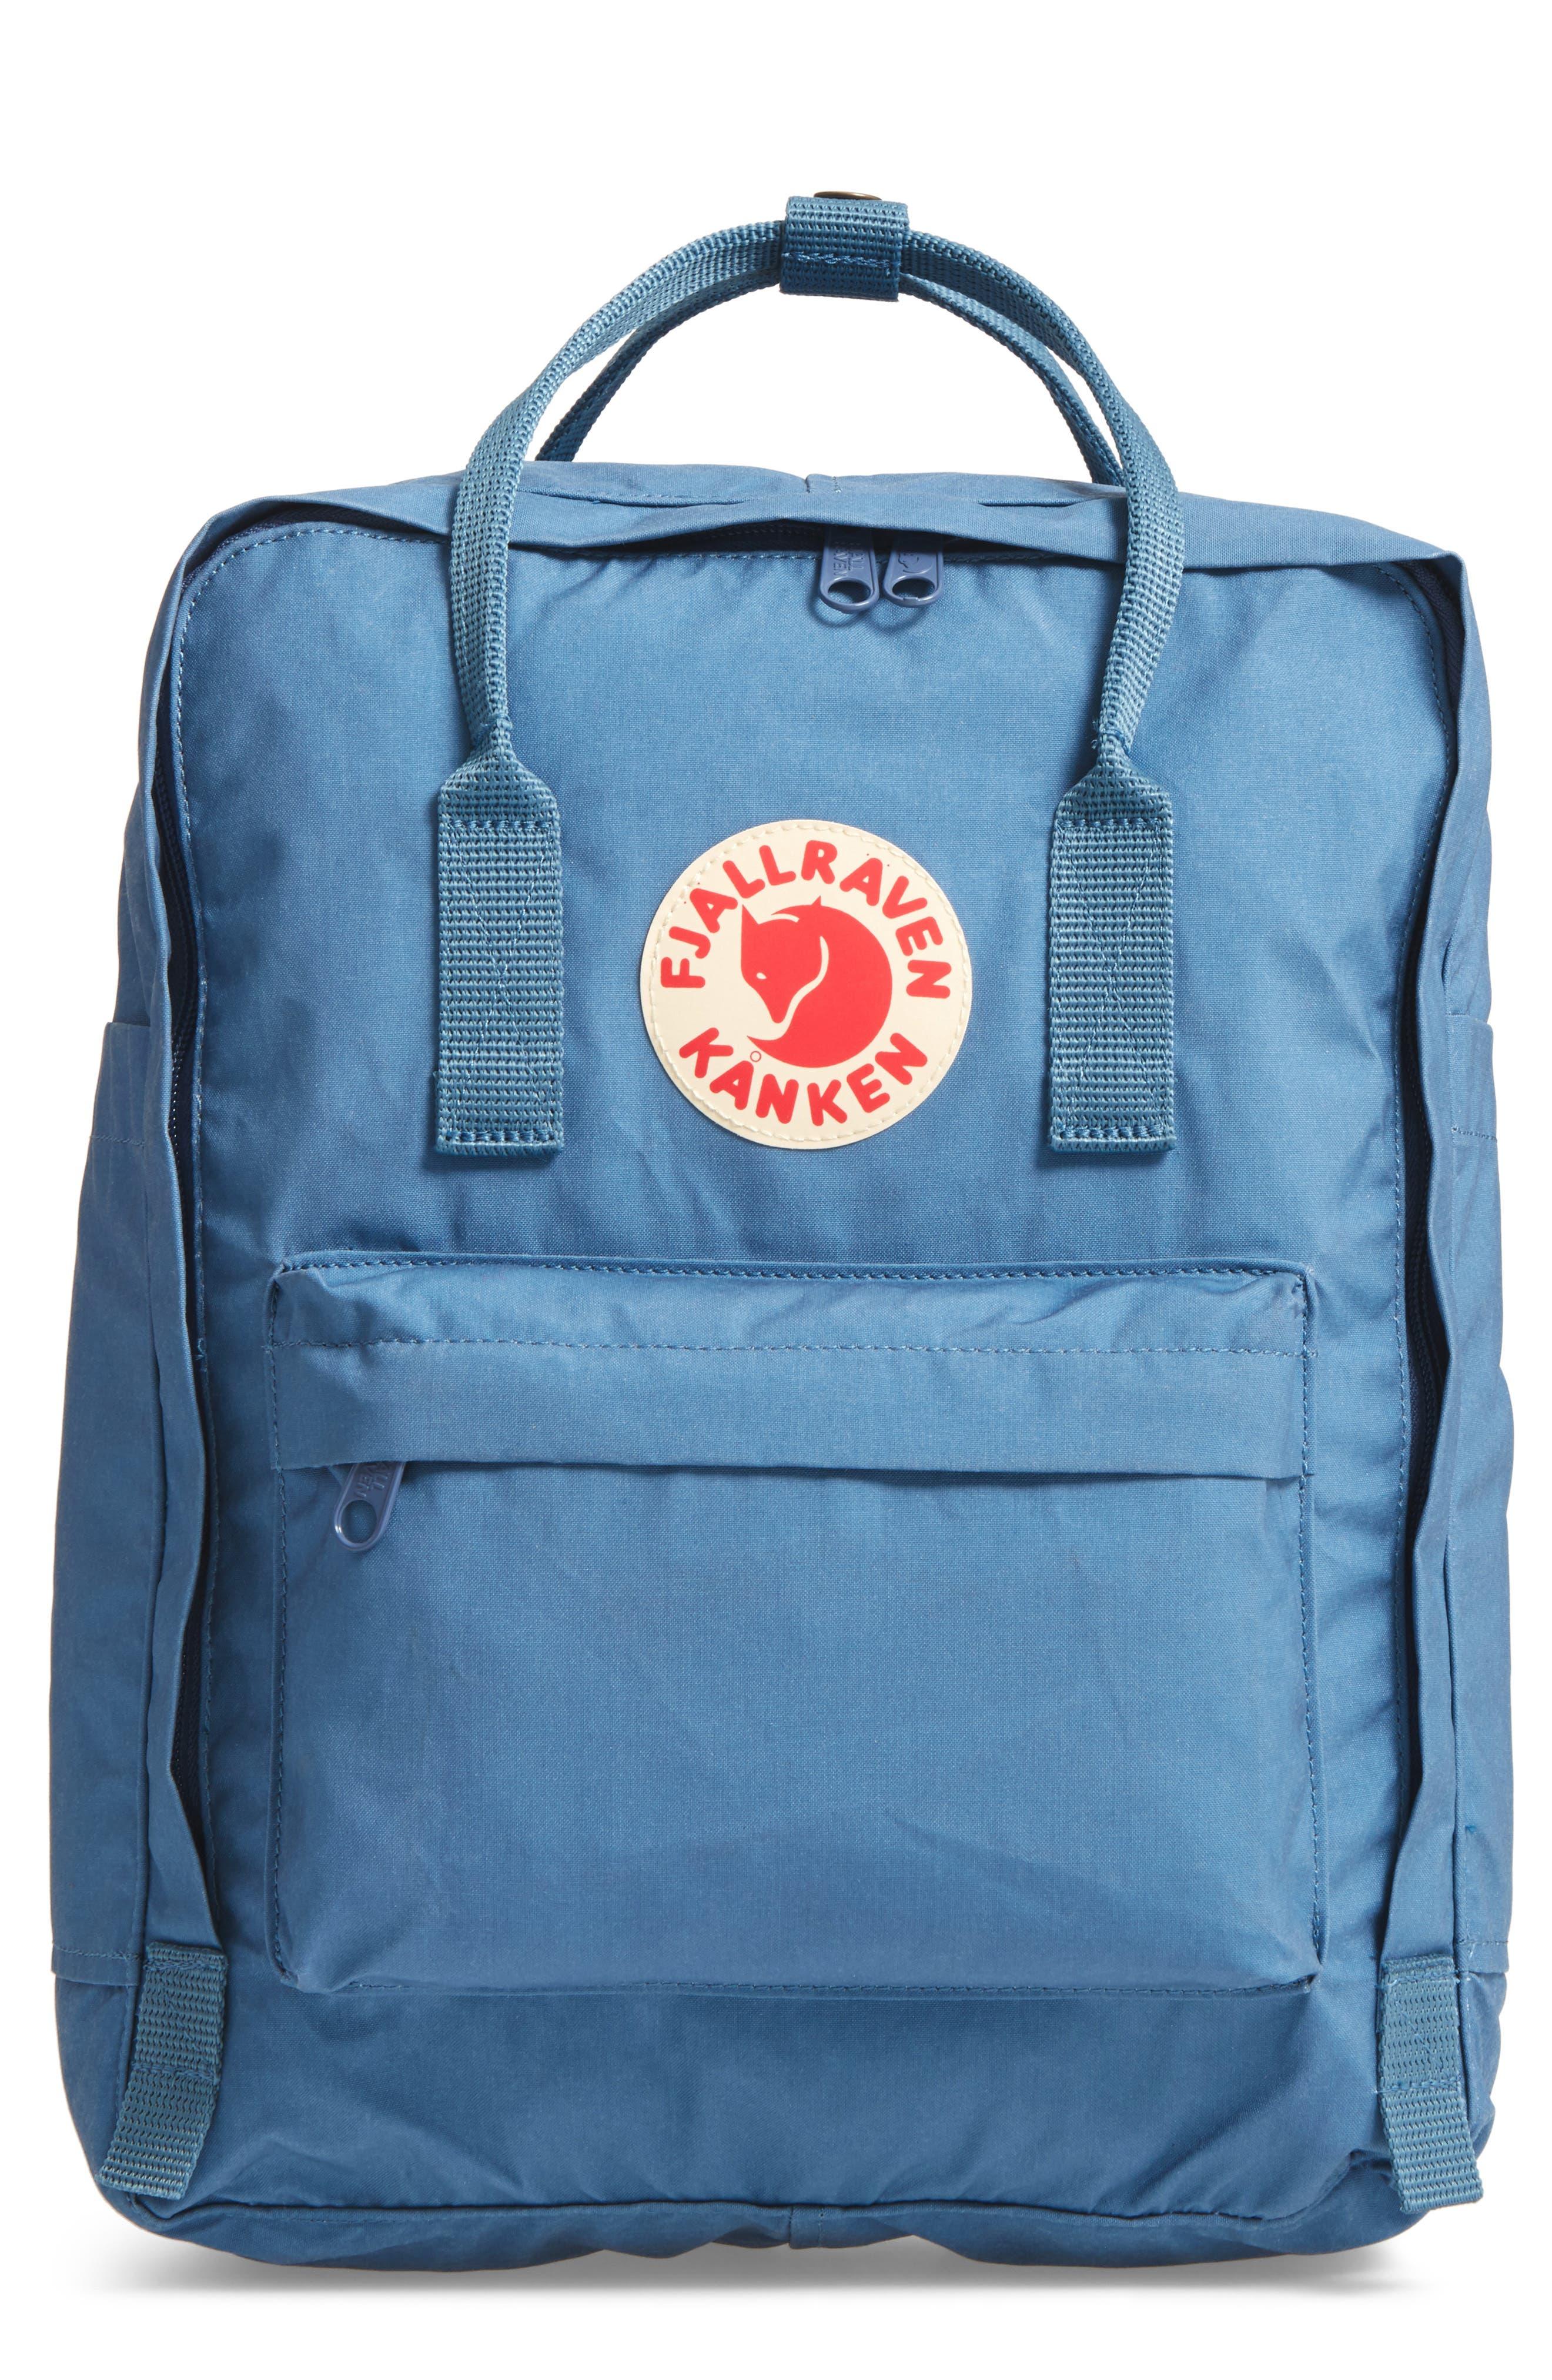 'Kånken' Water Resistant Backpack,                             Main thumbnail 1, color,                             Blue Ridge